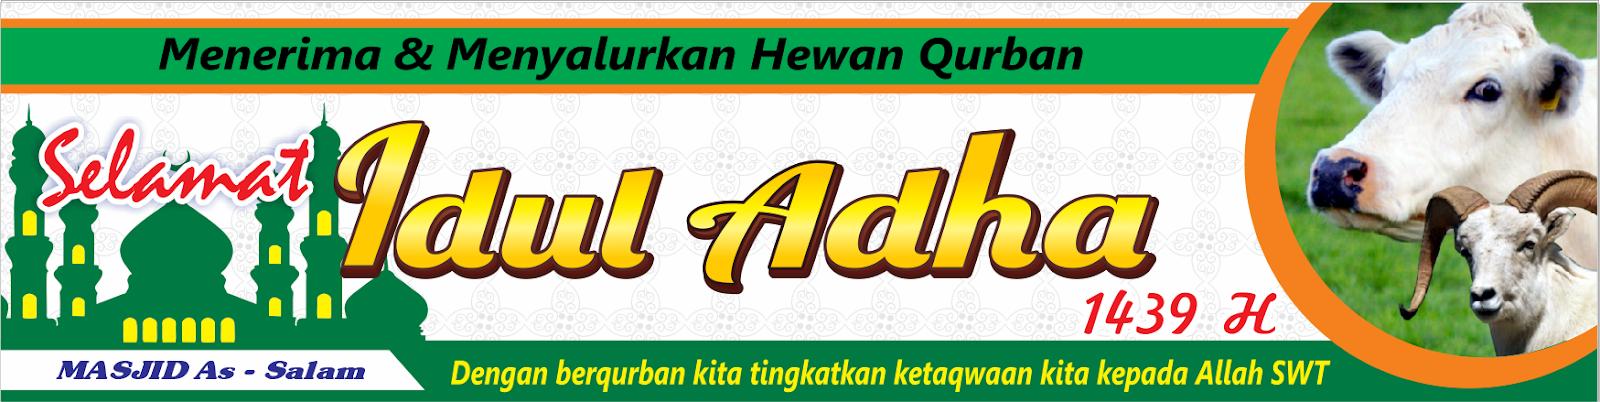 Contoh Desain Spanduk Idul Adha Format CDR - Contoh Design ...